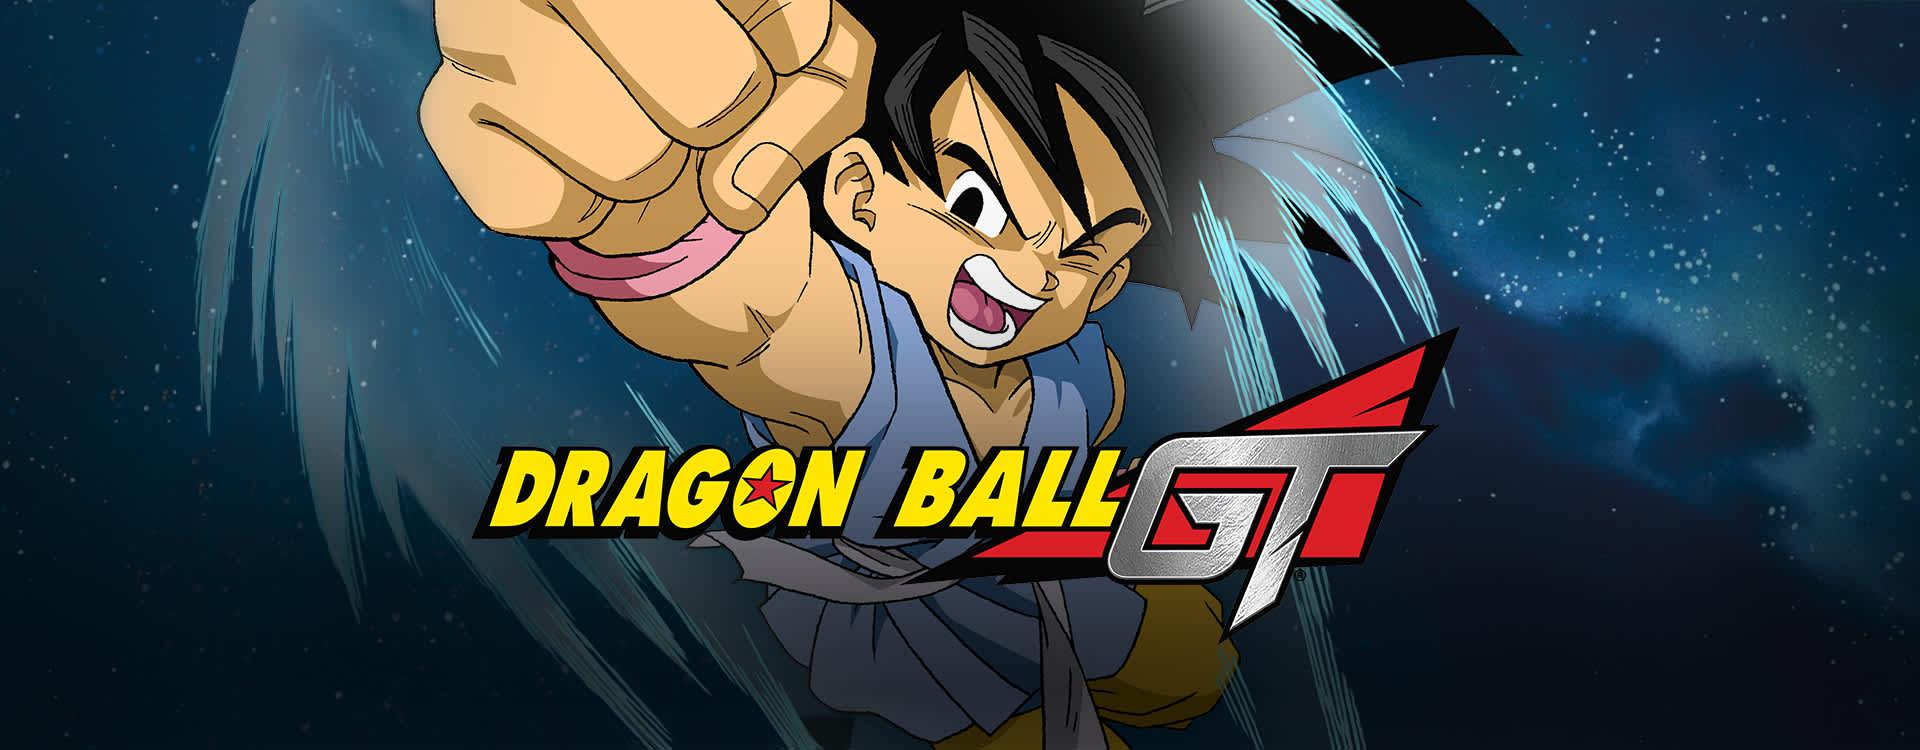 Dragonball Stream English